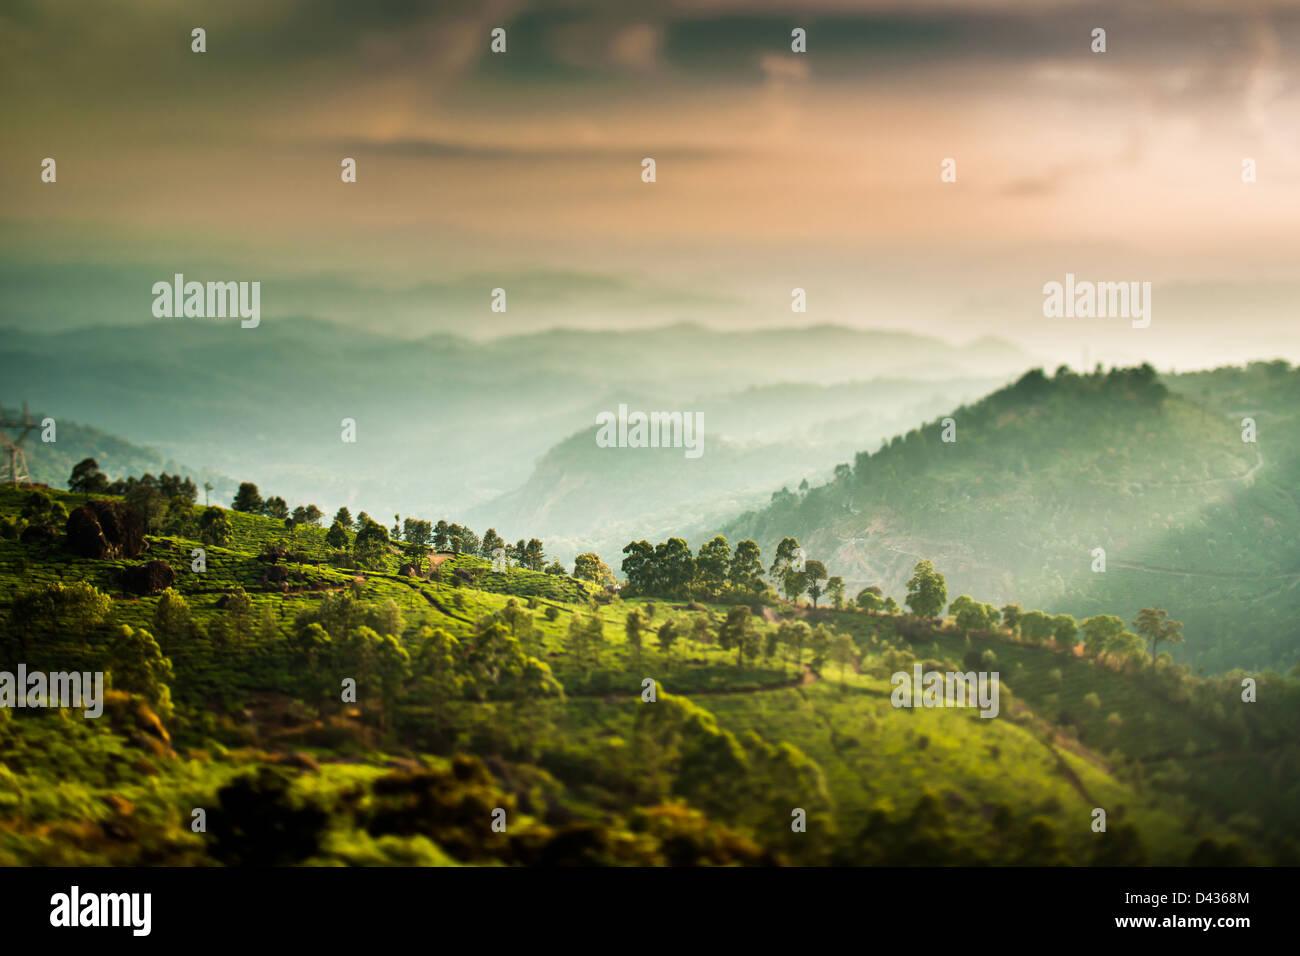 Morning Shift Imágenes De Stock & Morning Shift Fotos De Stock - Alamy